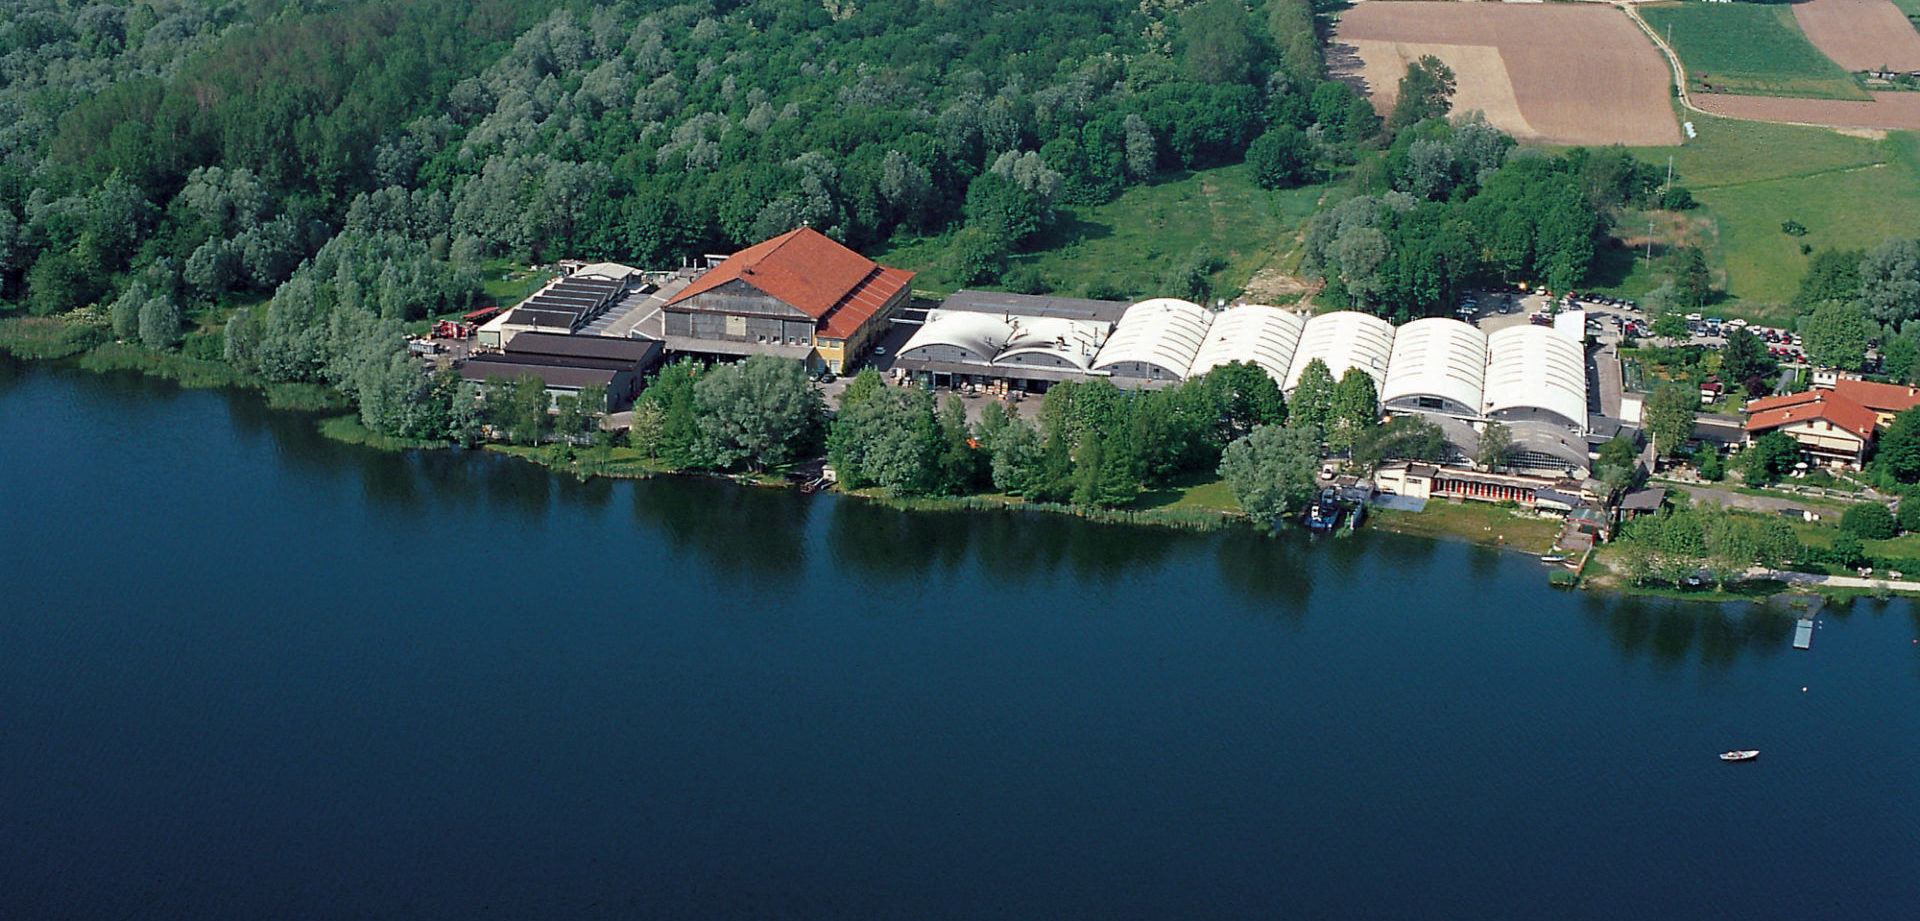 MV Agusta's headquarters in Italy. Photo courtesy of MV Agusta.